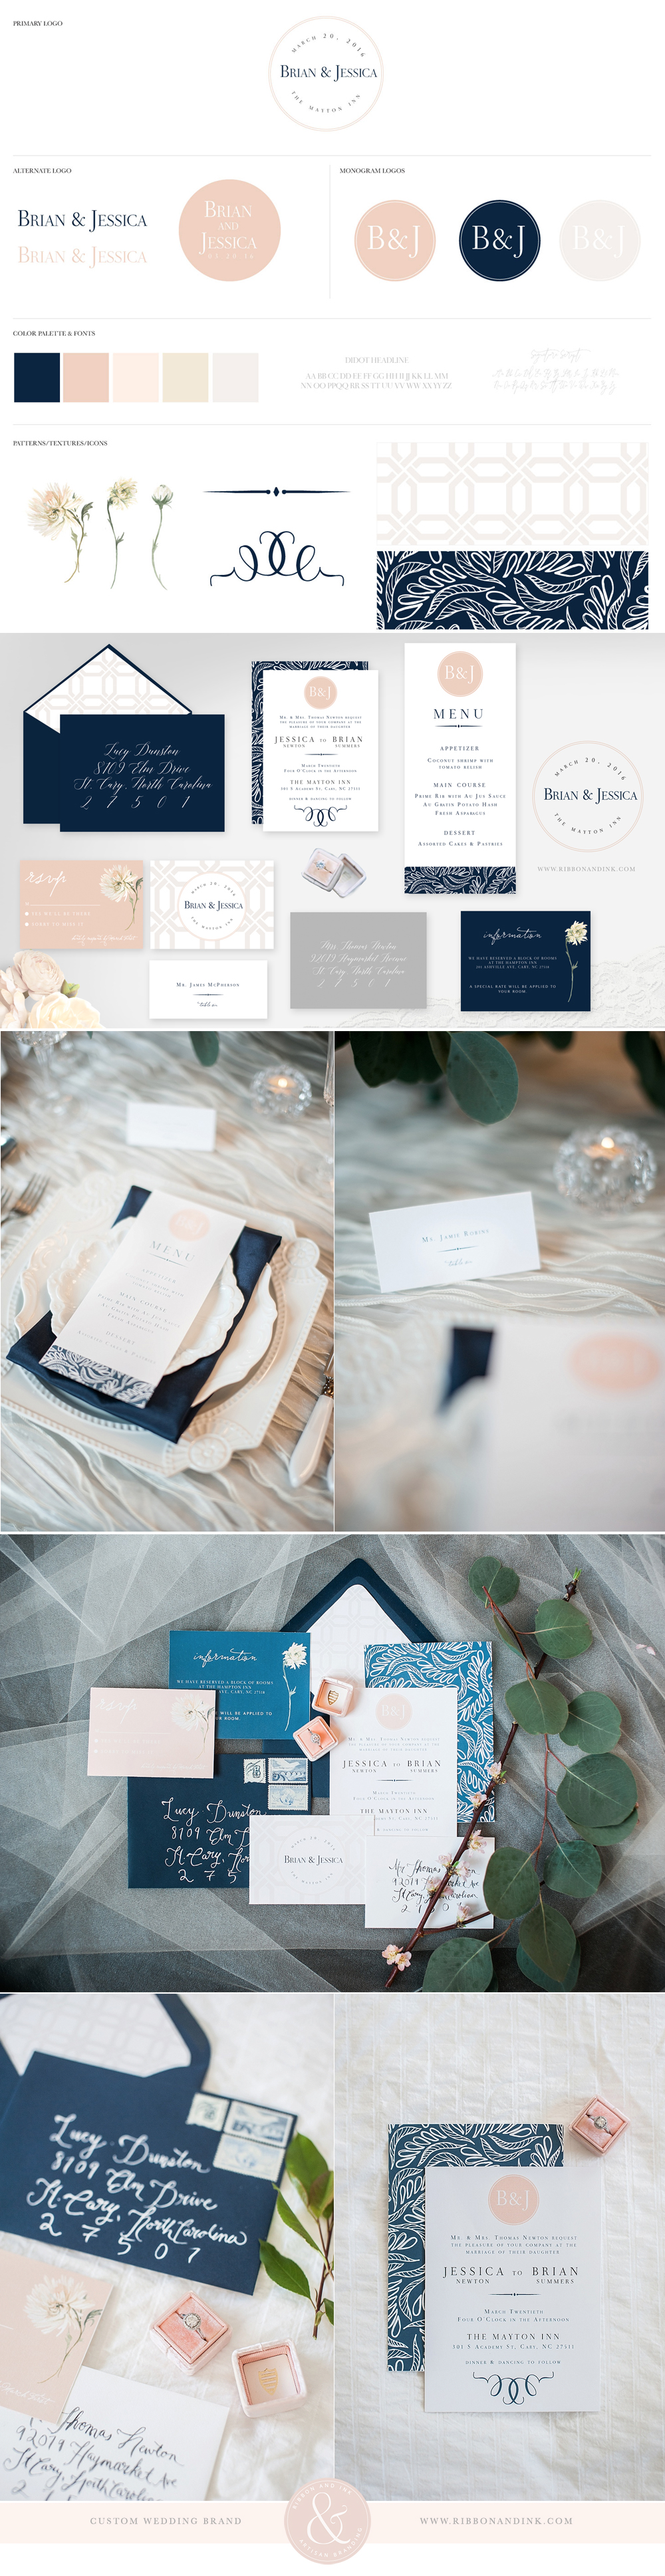 Wedding Brand & Styled Shoot | Pinterest